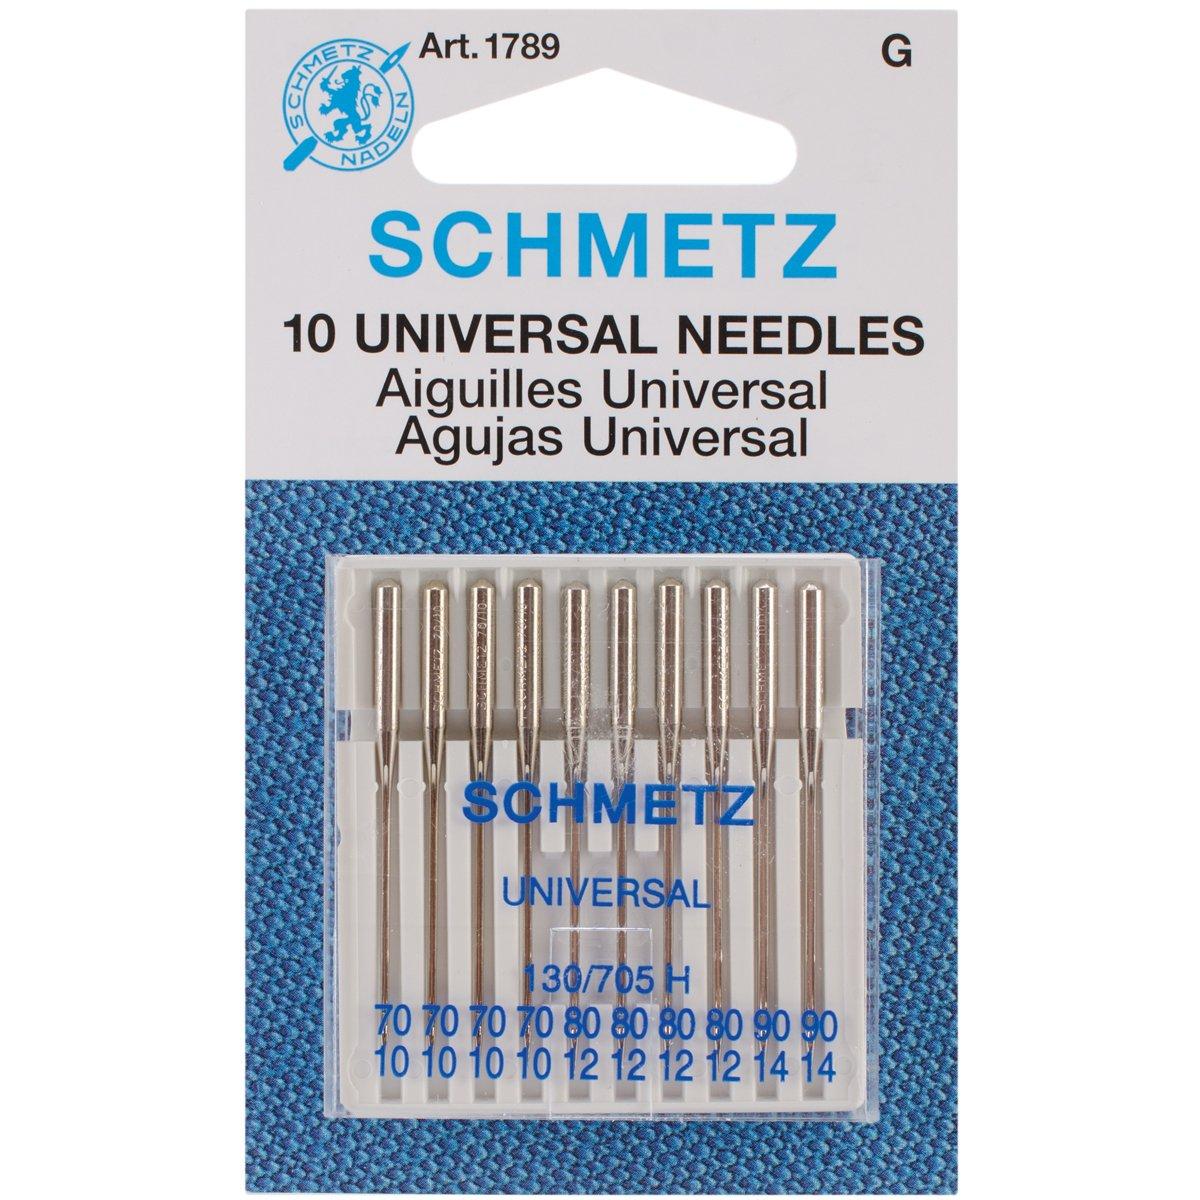 Euro-Notions Universal Machine Needles product image